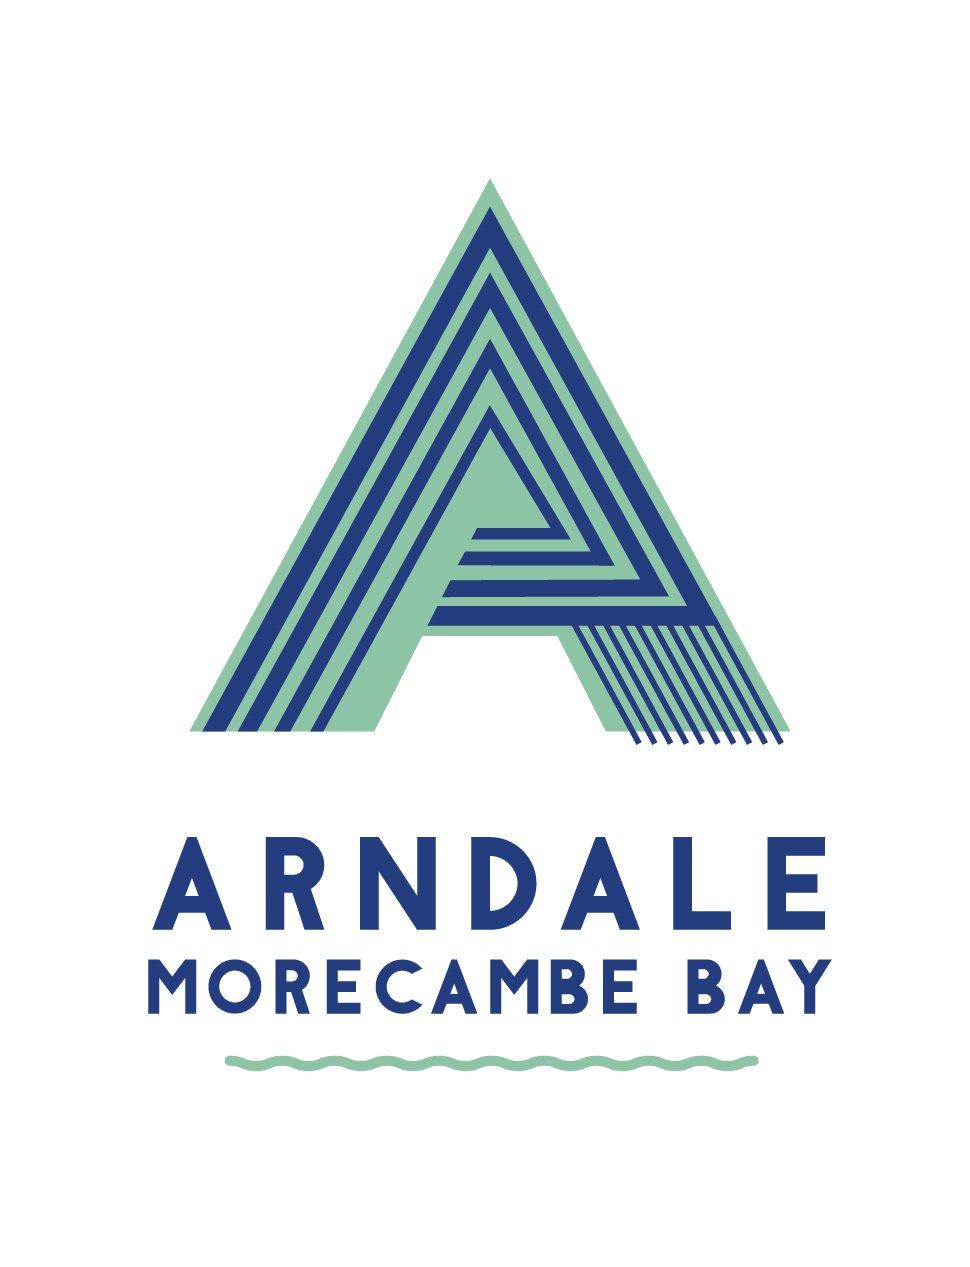 arndale morecambe